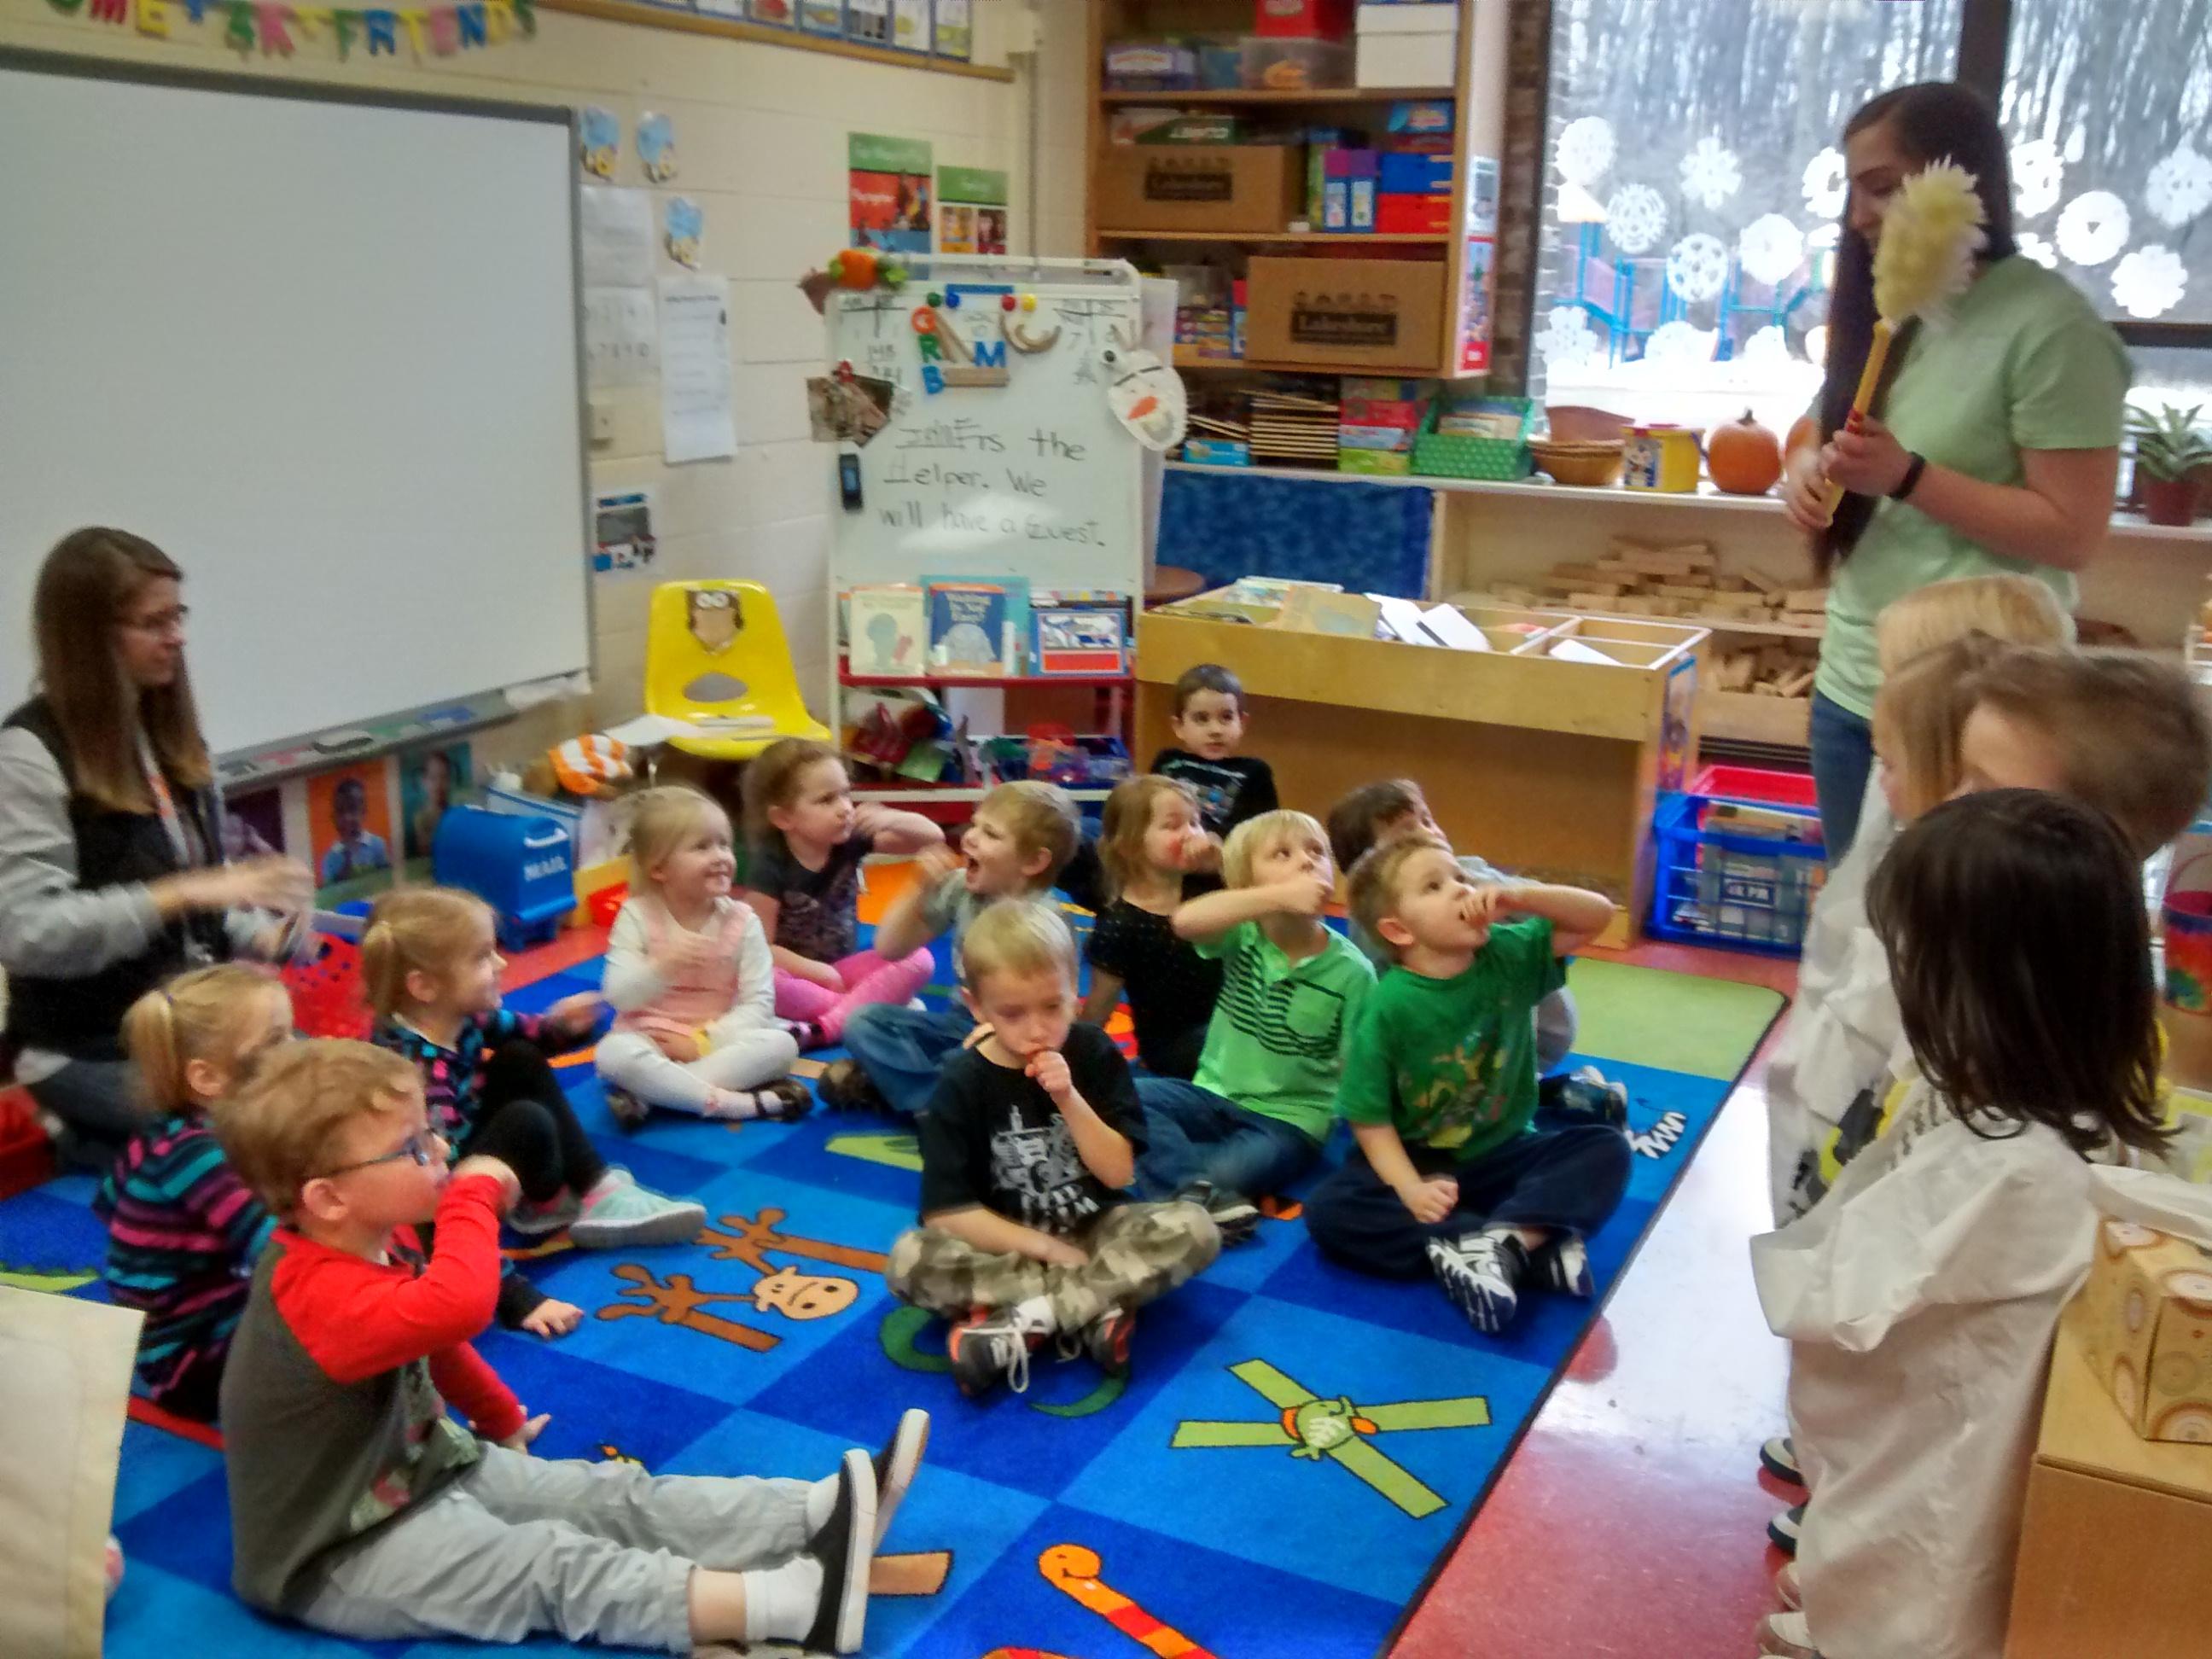 School Presentations Day 2 At Woodview Elementary School